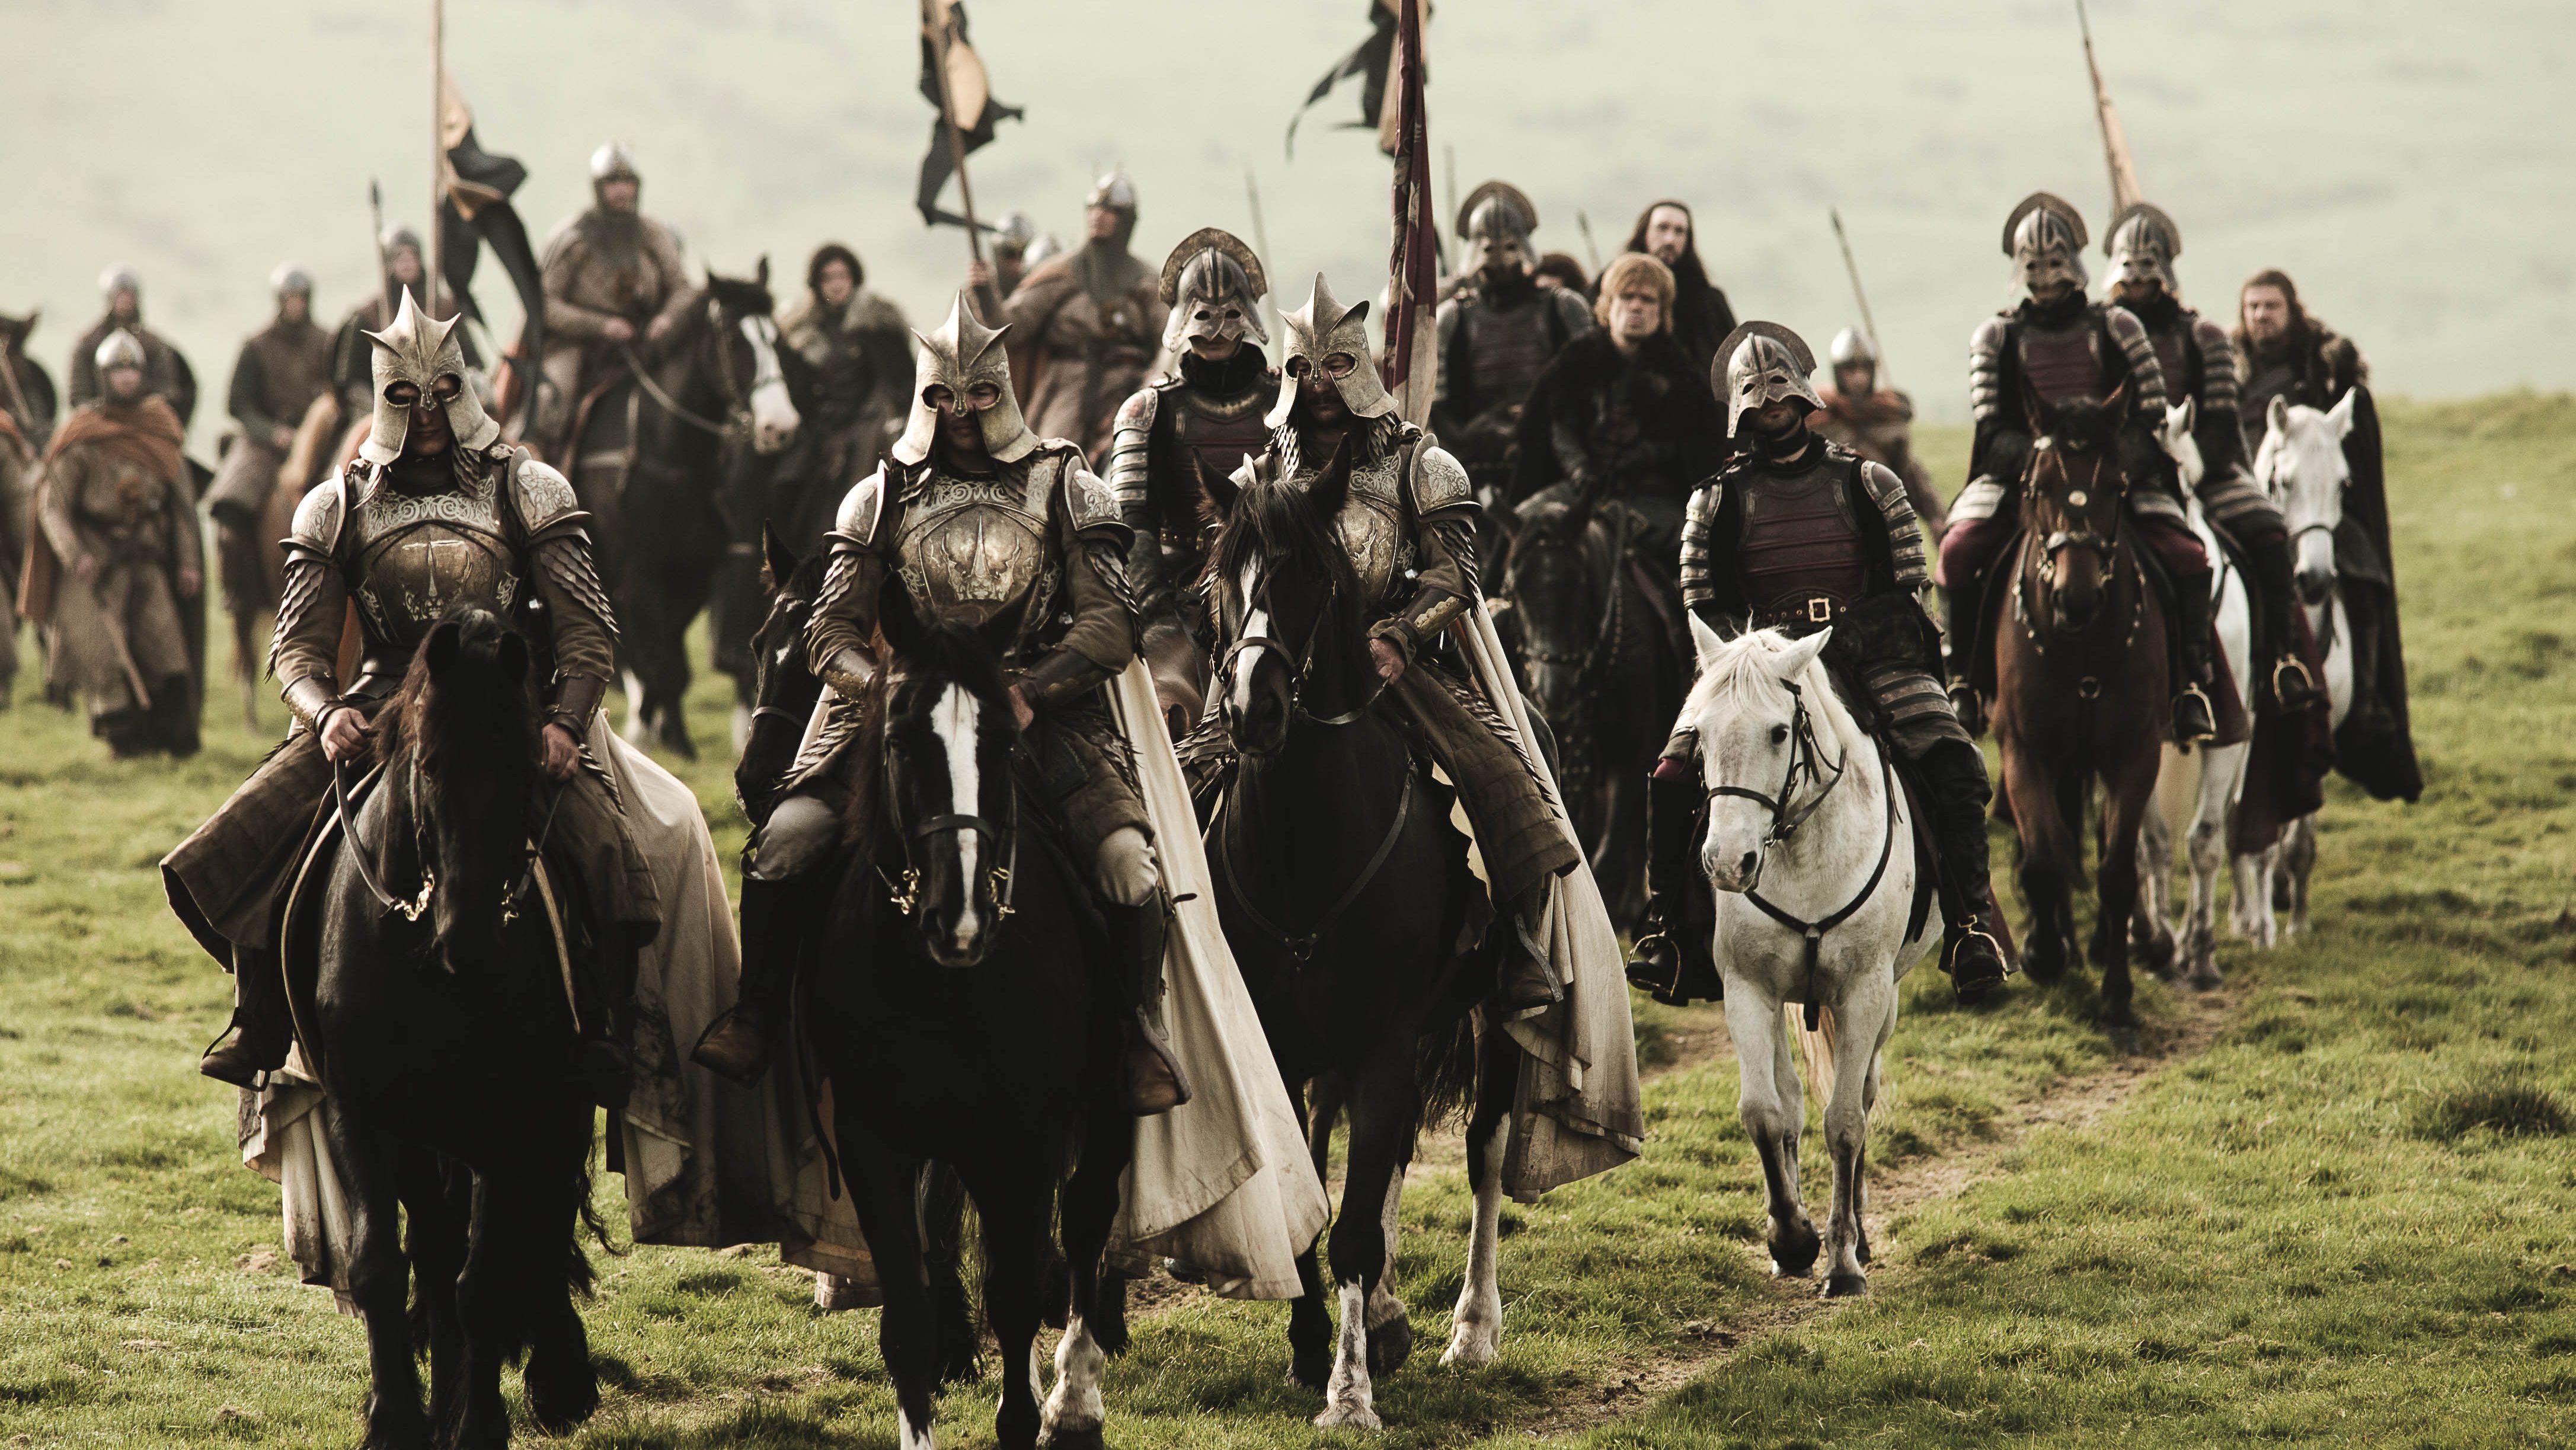 hbo thrones westeros kingsguard